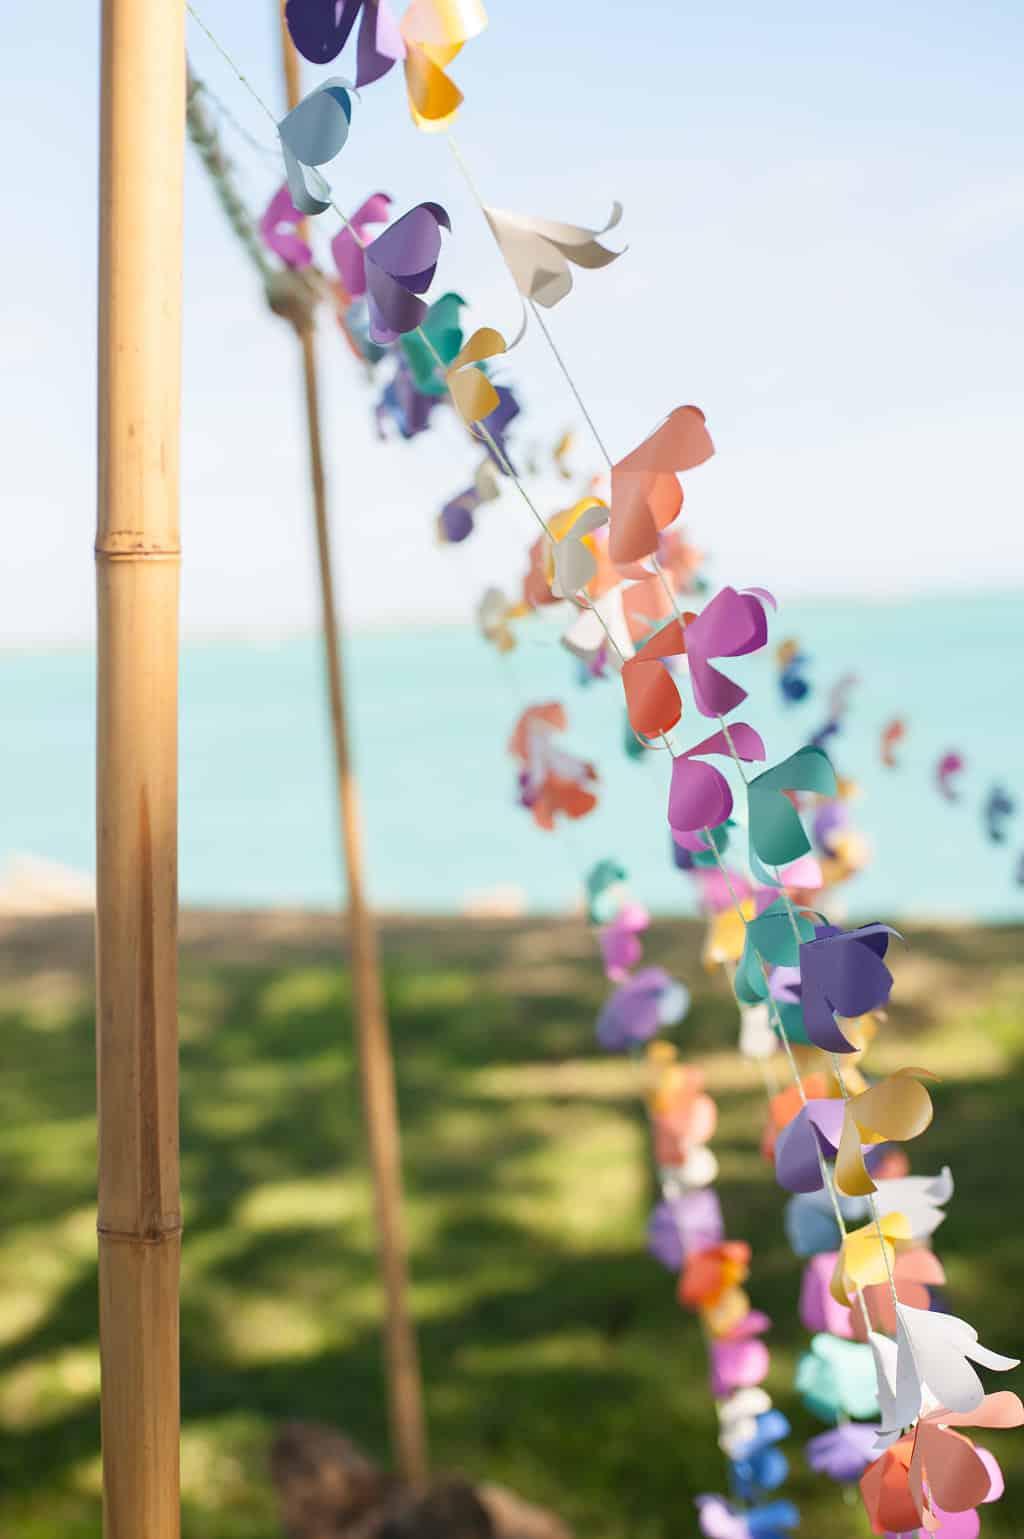 DIY wedding arch with paper flower lei garland